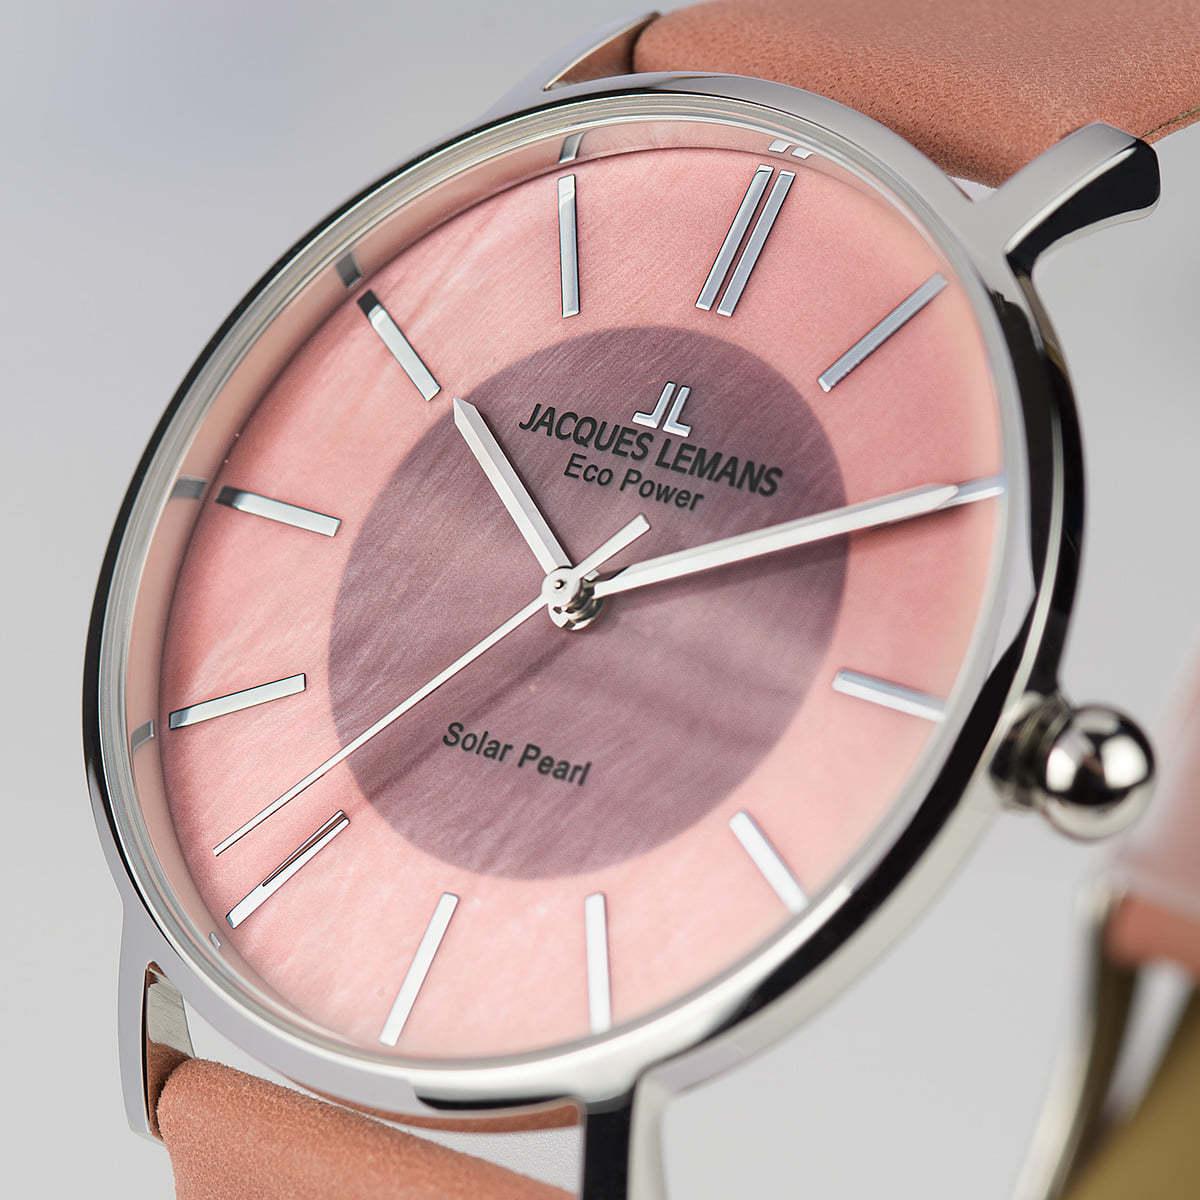 Damenuhr, Jaques Lemans, rosa, lila, Muttertag 2021, Geschenkideen, 9020 Klagenfurt am Wörthersee